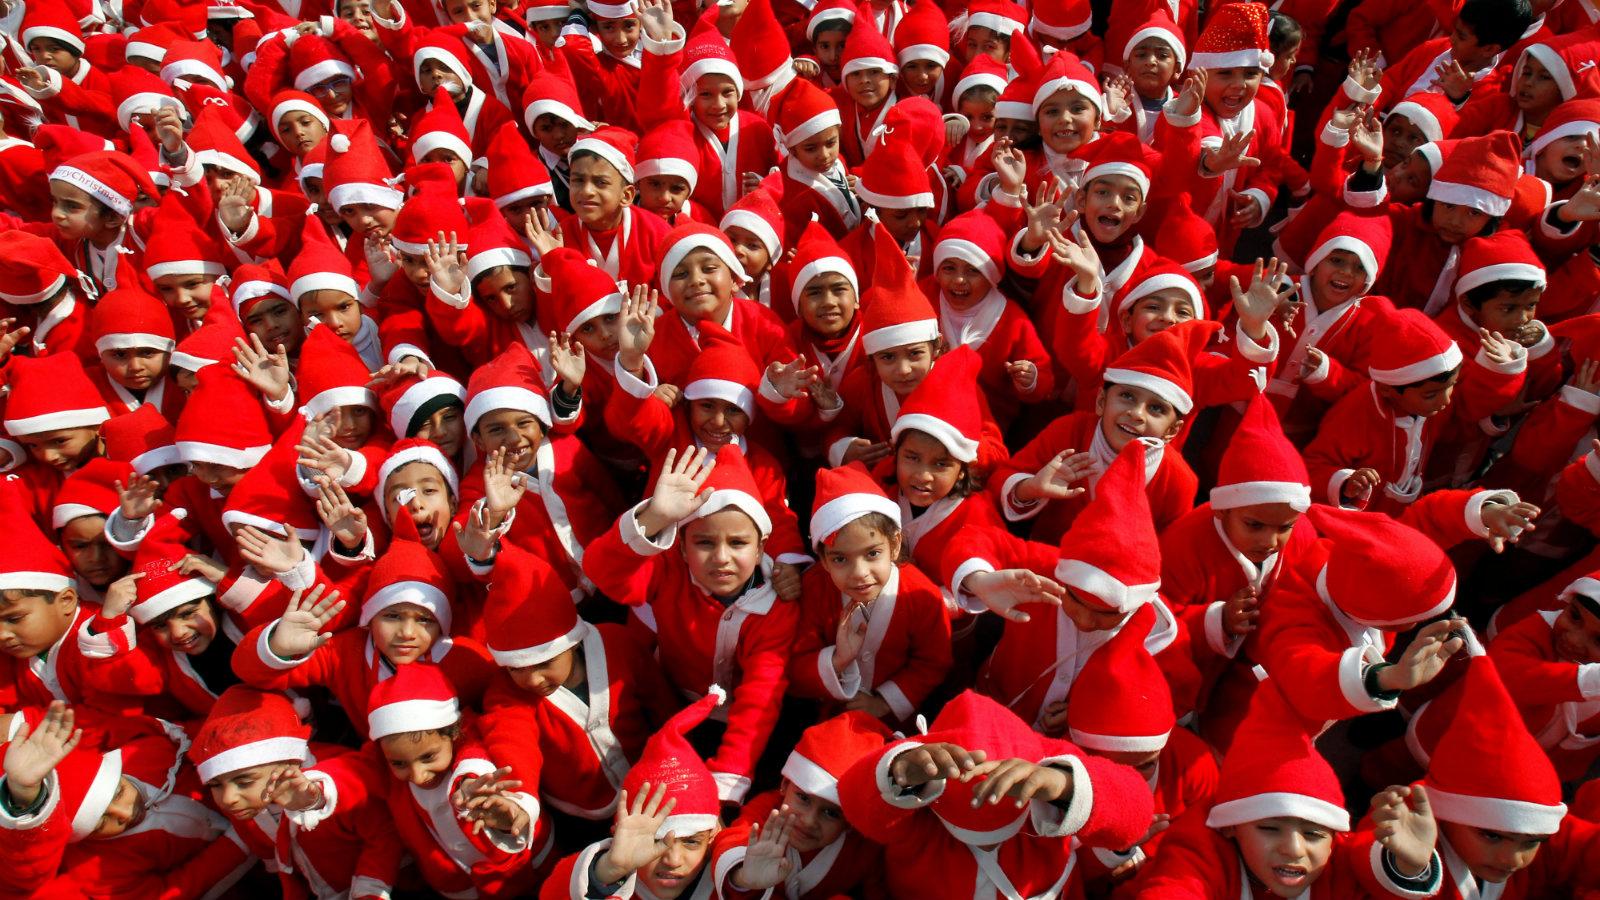 Christmas In India Images.In Photos Christmas In India Quartz India